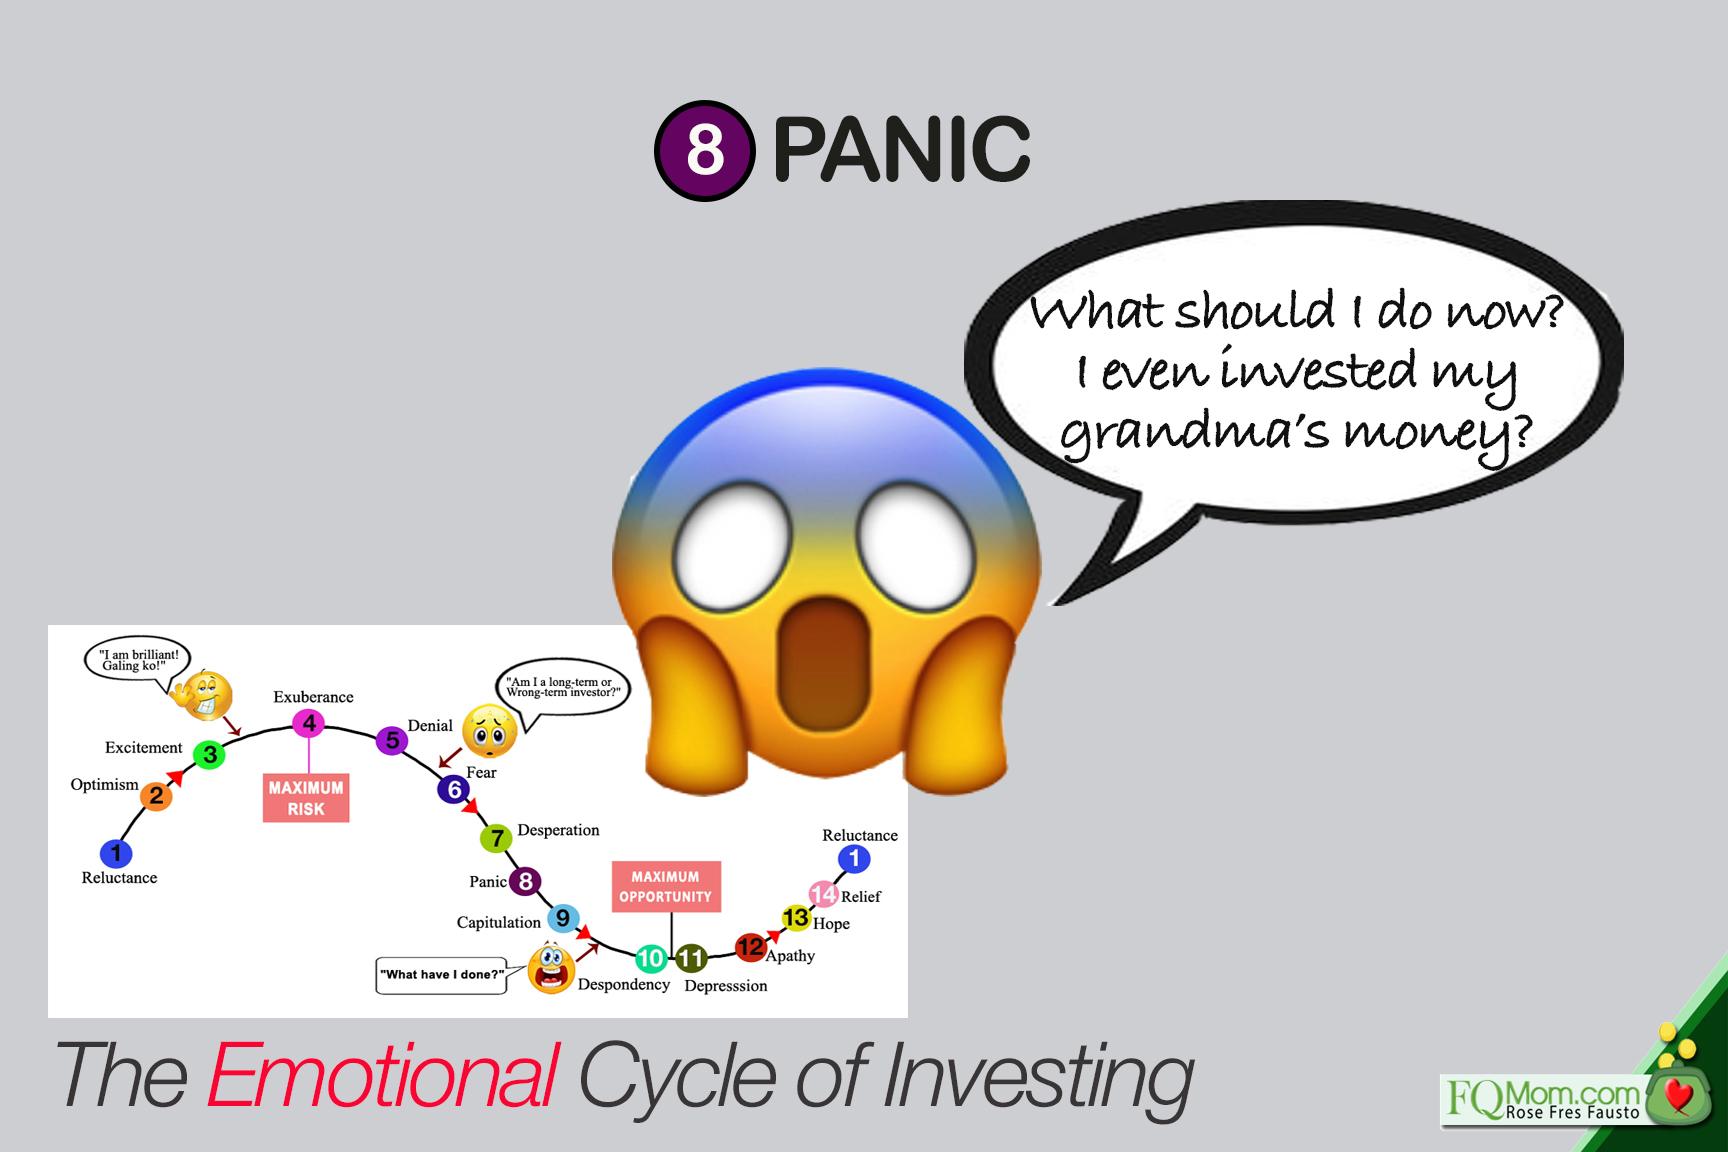 8-panic